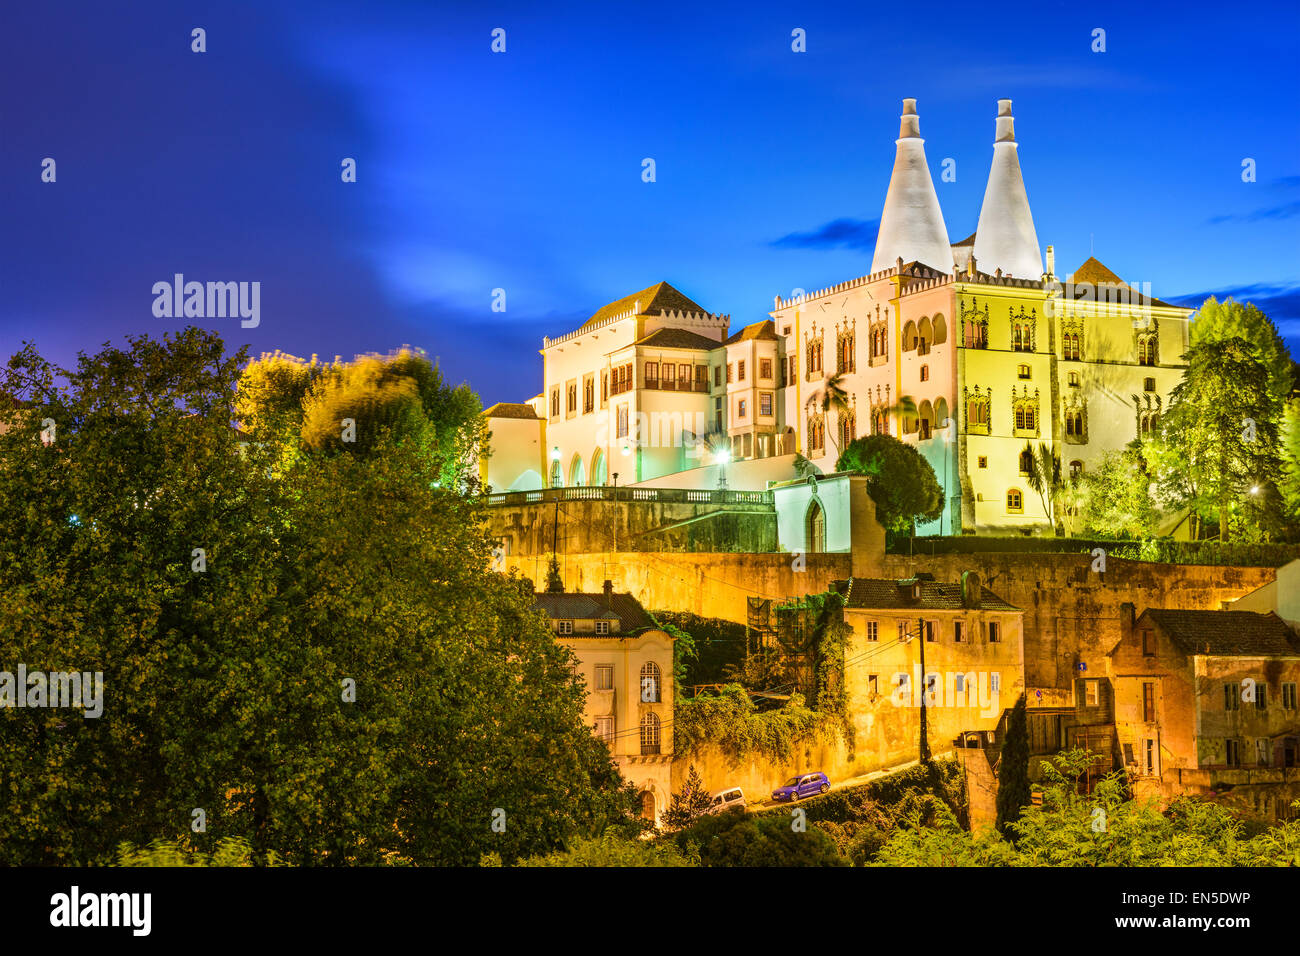 Sintra, Portugal im Nationalpalast von Sintra. Stockbild